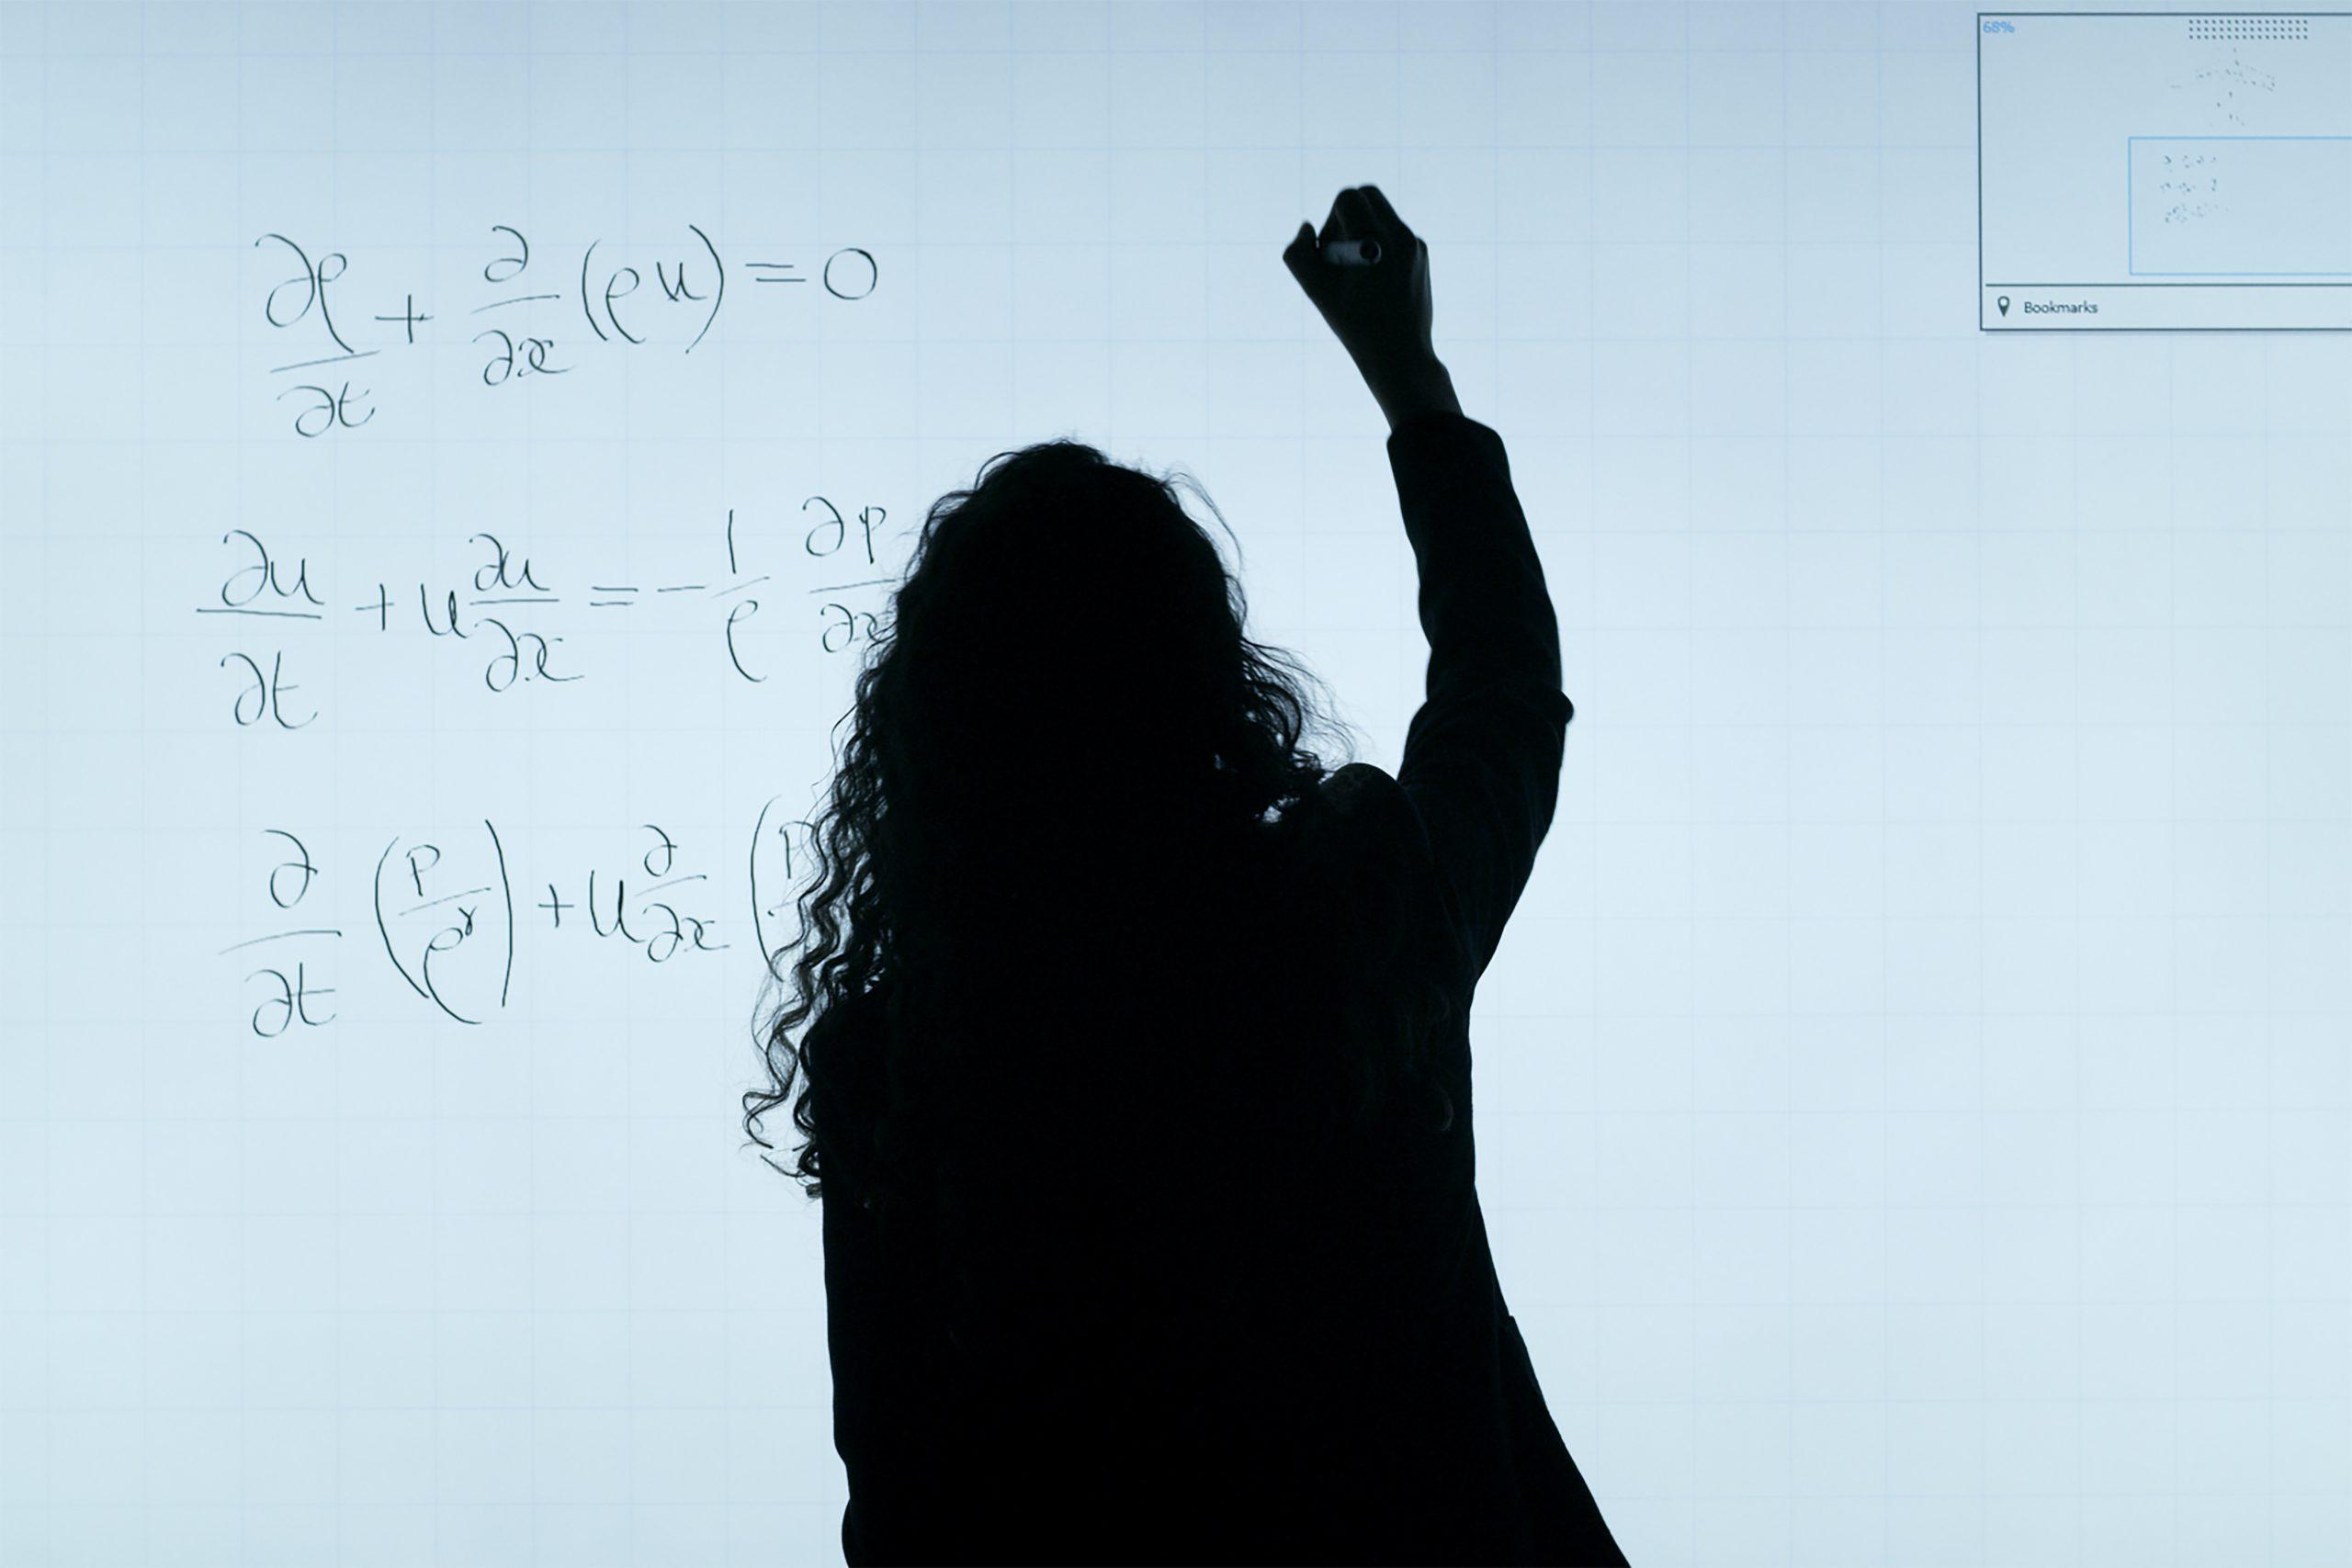 teacher writing equation on board